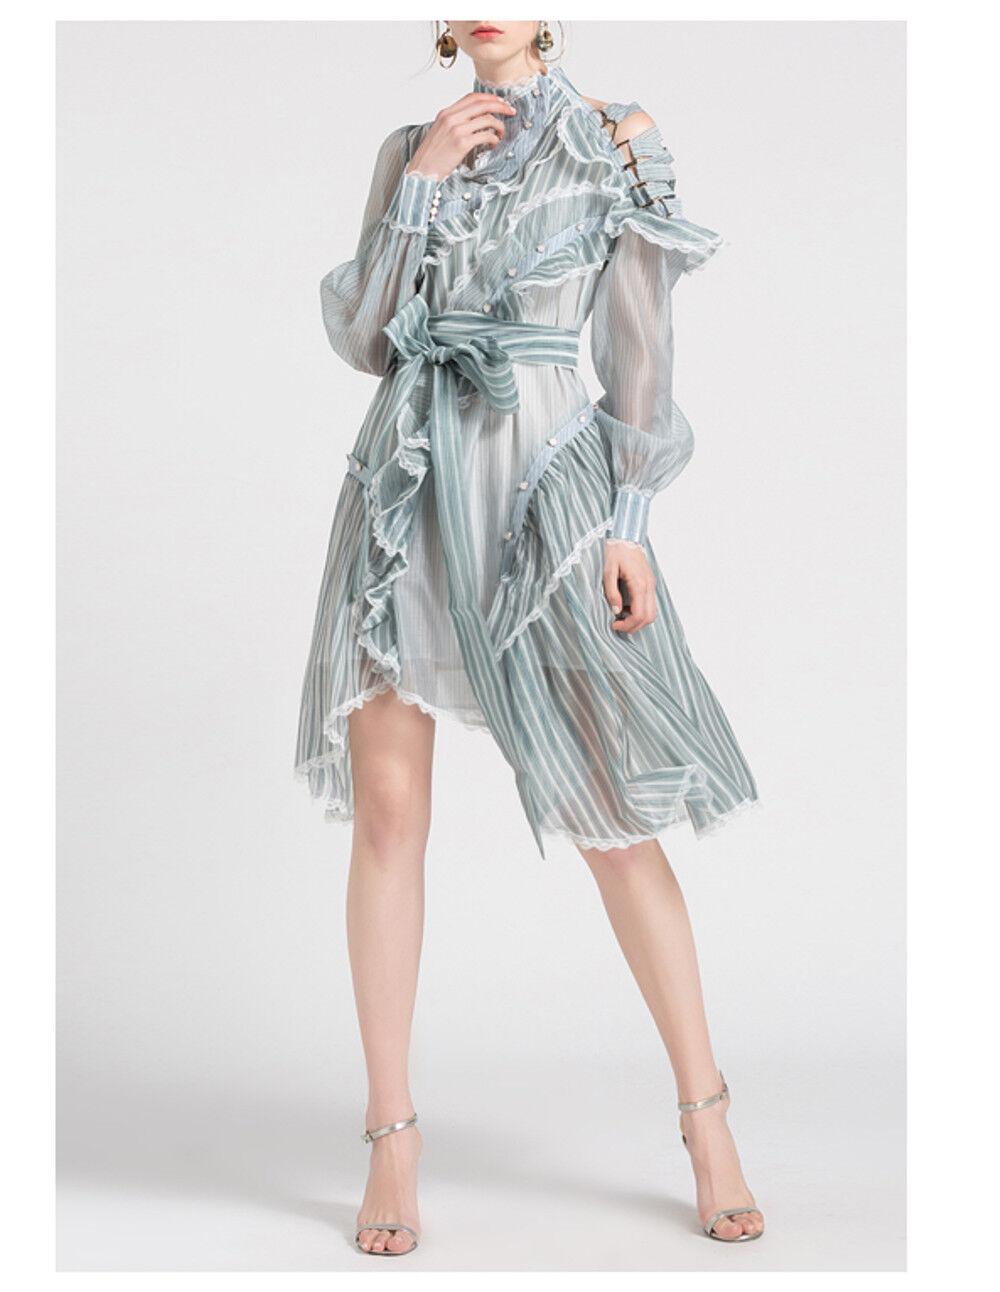 6c31192efd1f Women's Fashion Collar Irregular Design Sleeve Knee Length Dress Long  Runway npdmae4385-Dresses